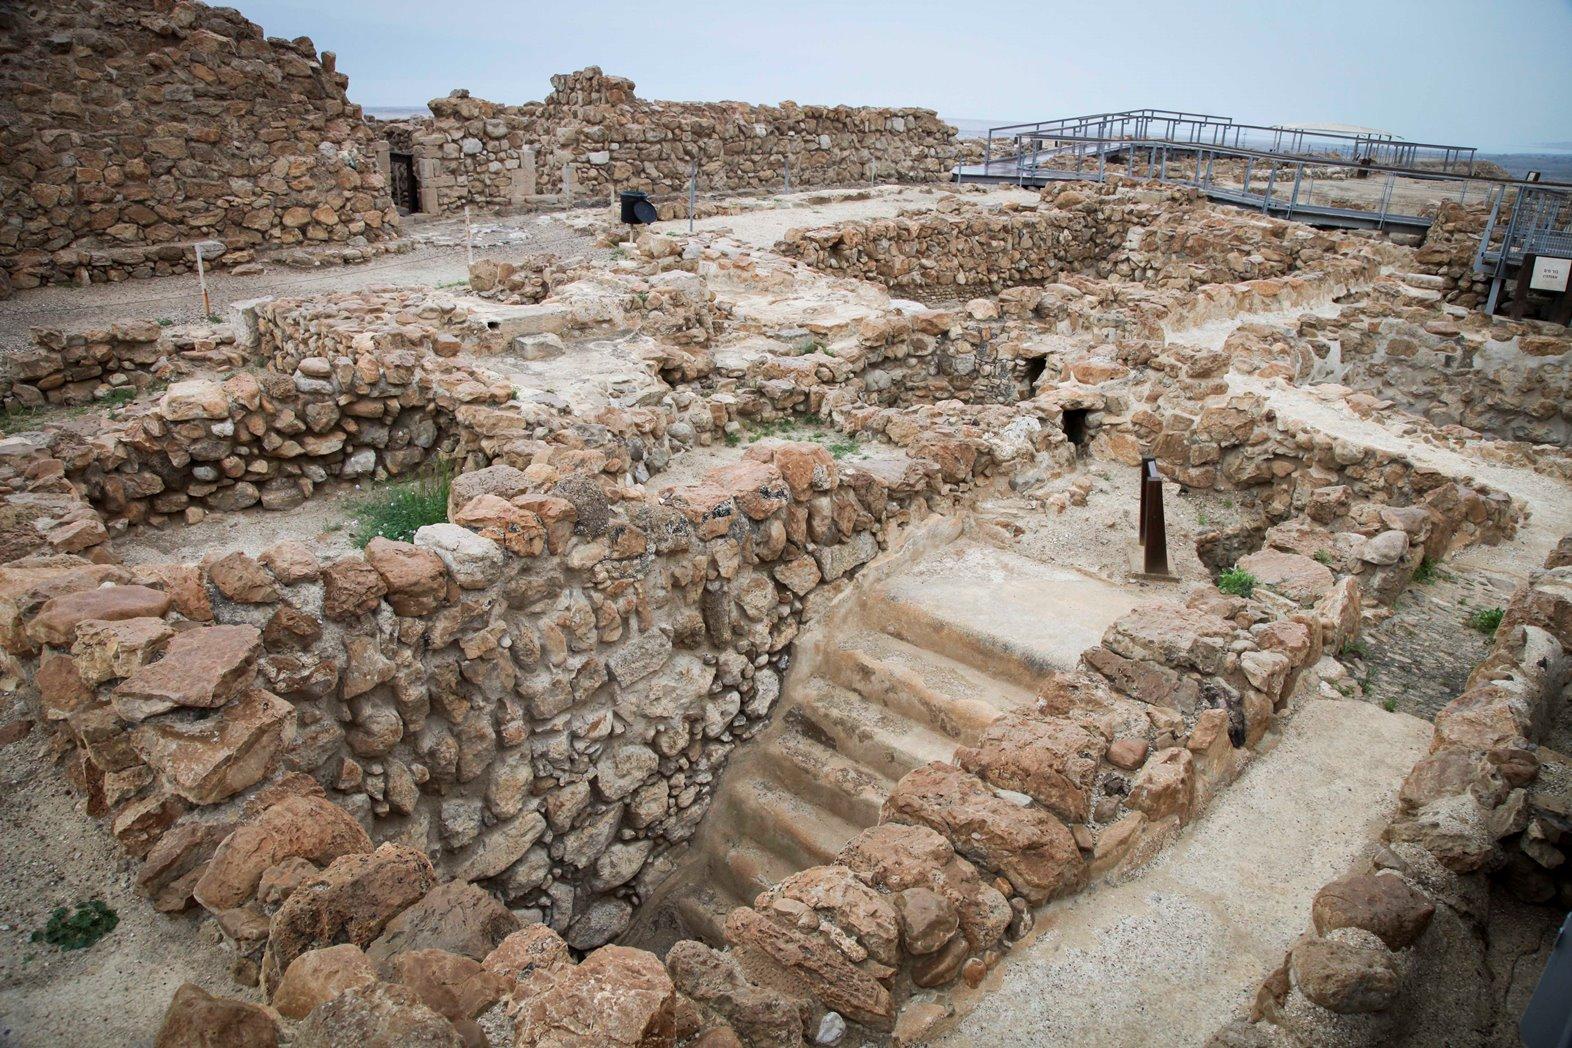 The archeological site at Qumran. Photo by Isaac Harari/FLASH90